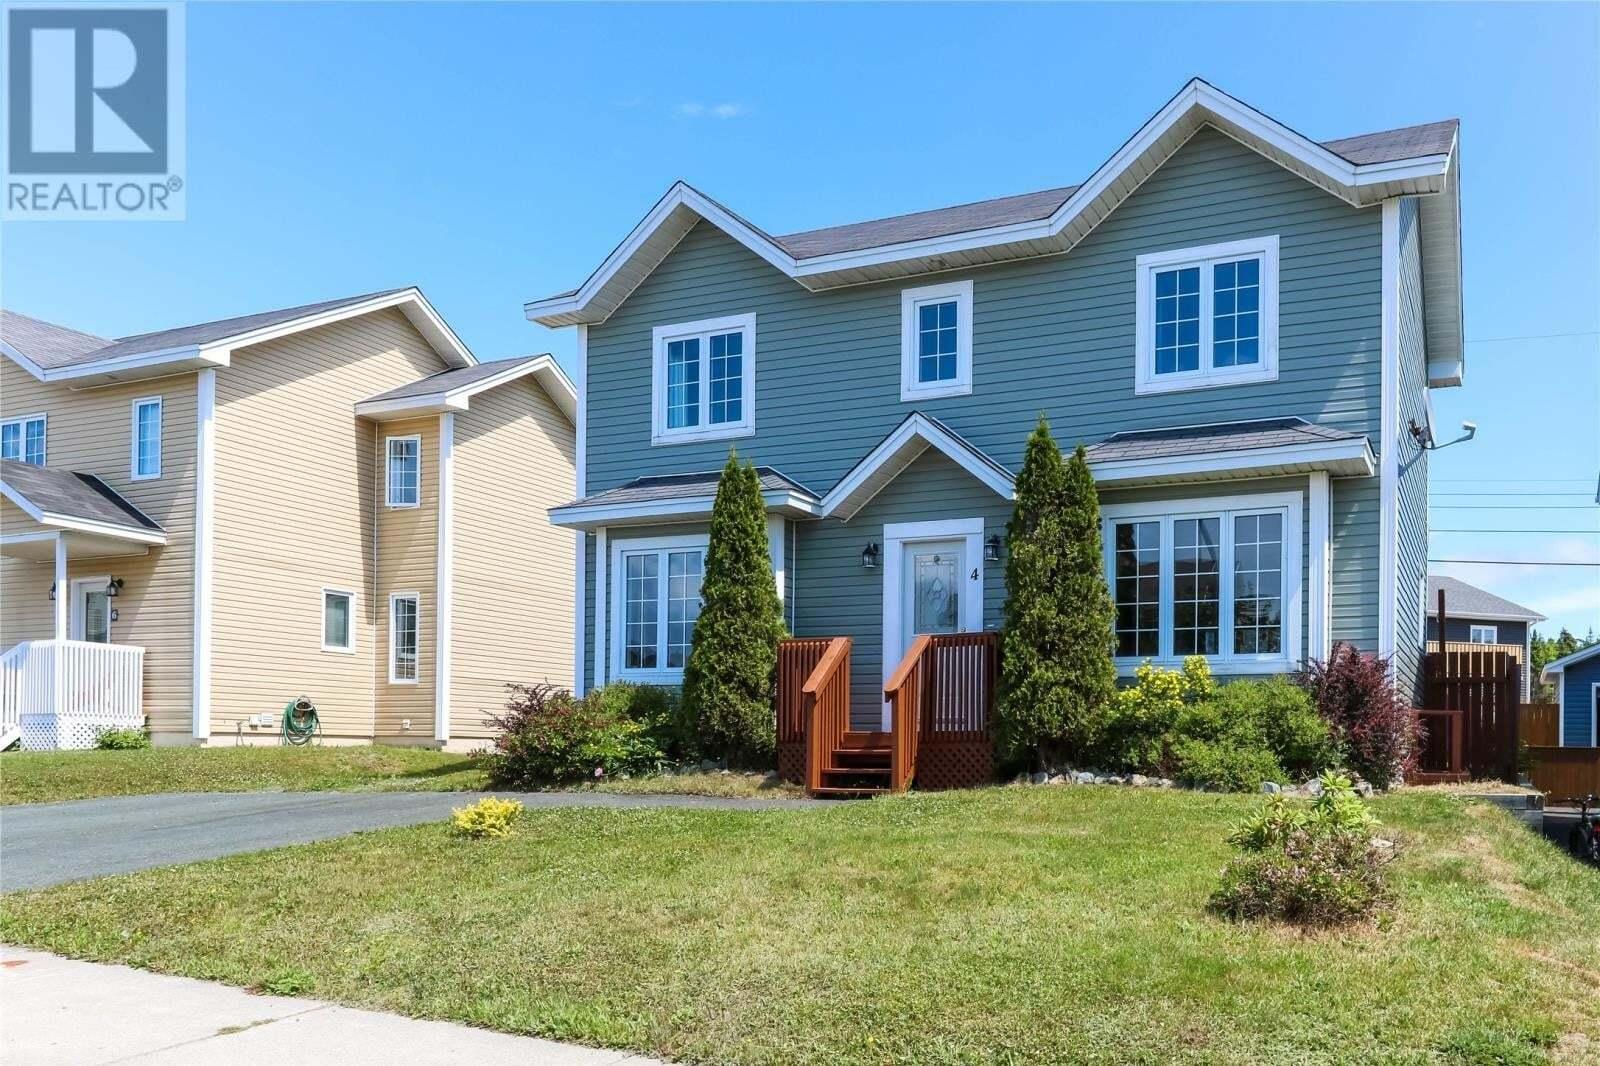 House for sale at 4 Sedgewick St Paradise Newfoundland - MLS: 1217628